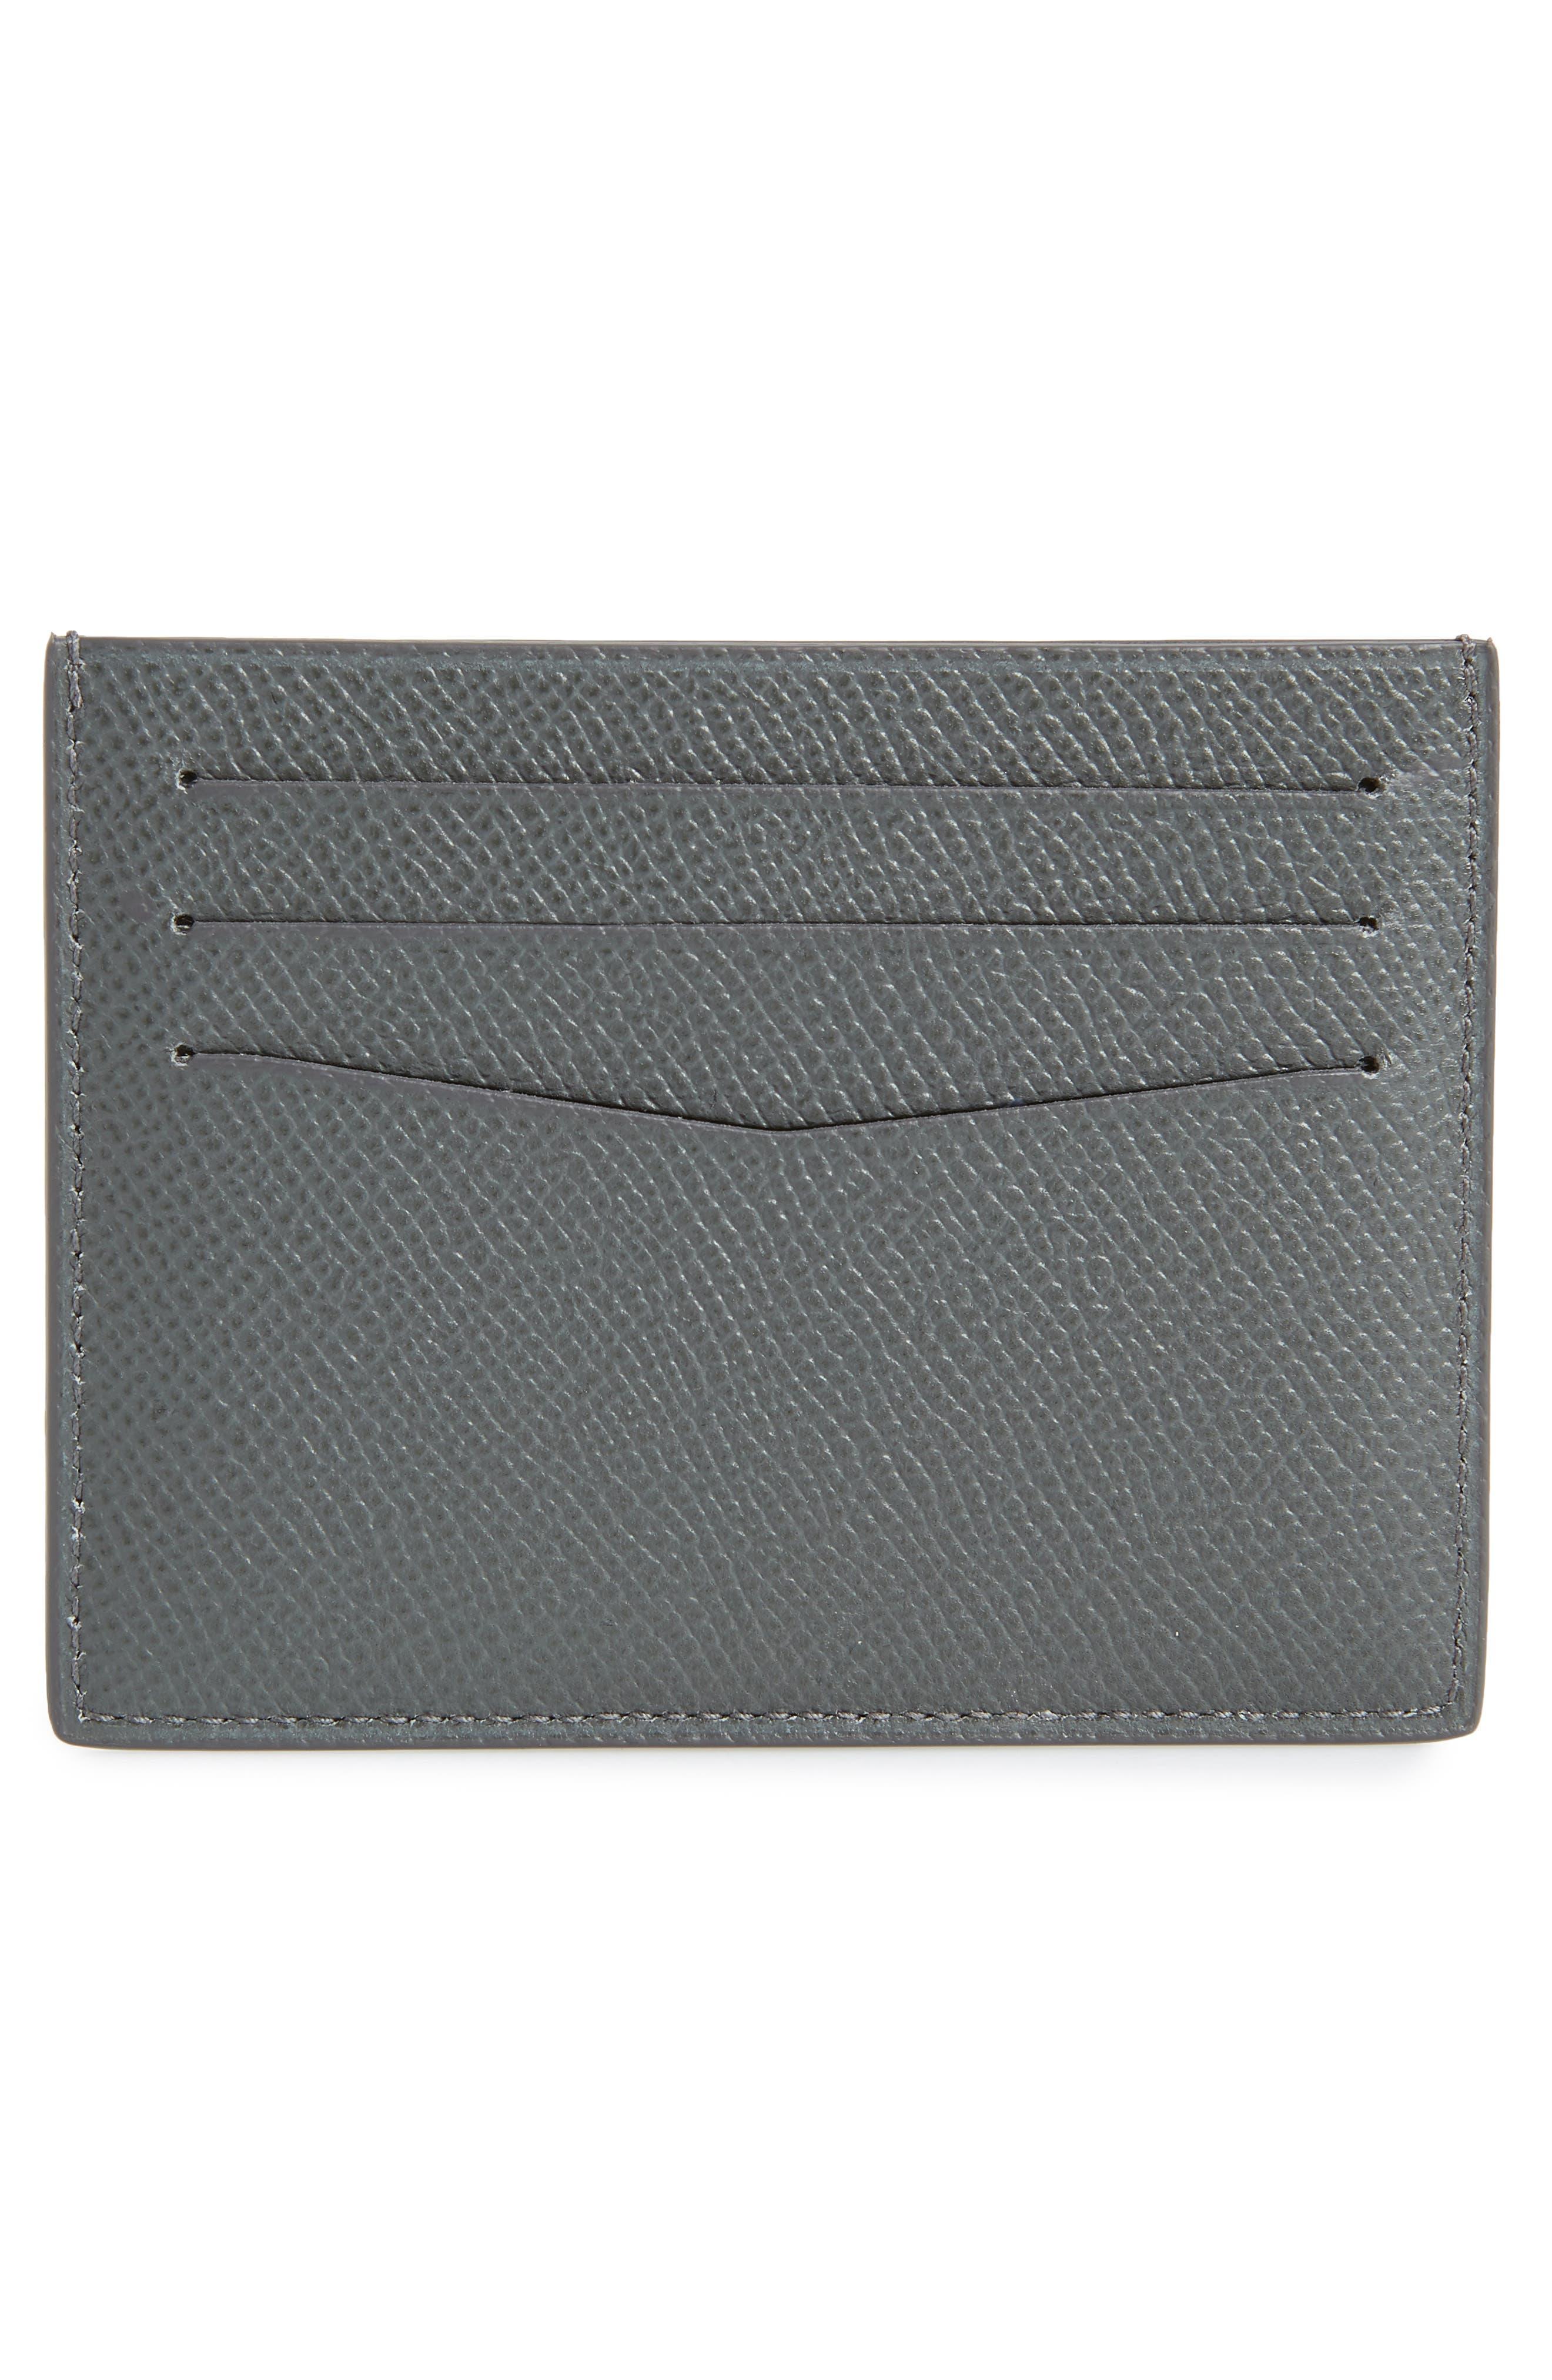 Cadogan Leather Card Case,                             Alternate thumbnail 2, color,                             GREY